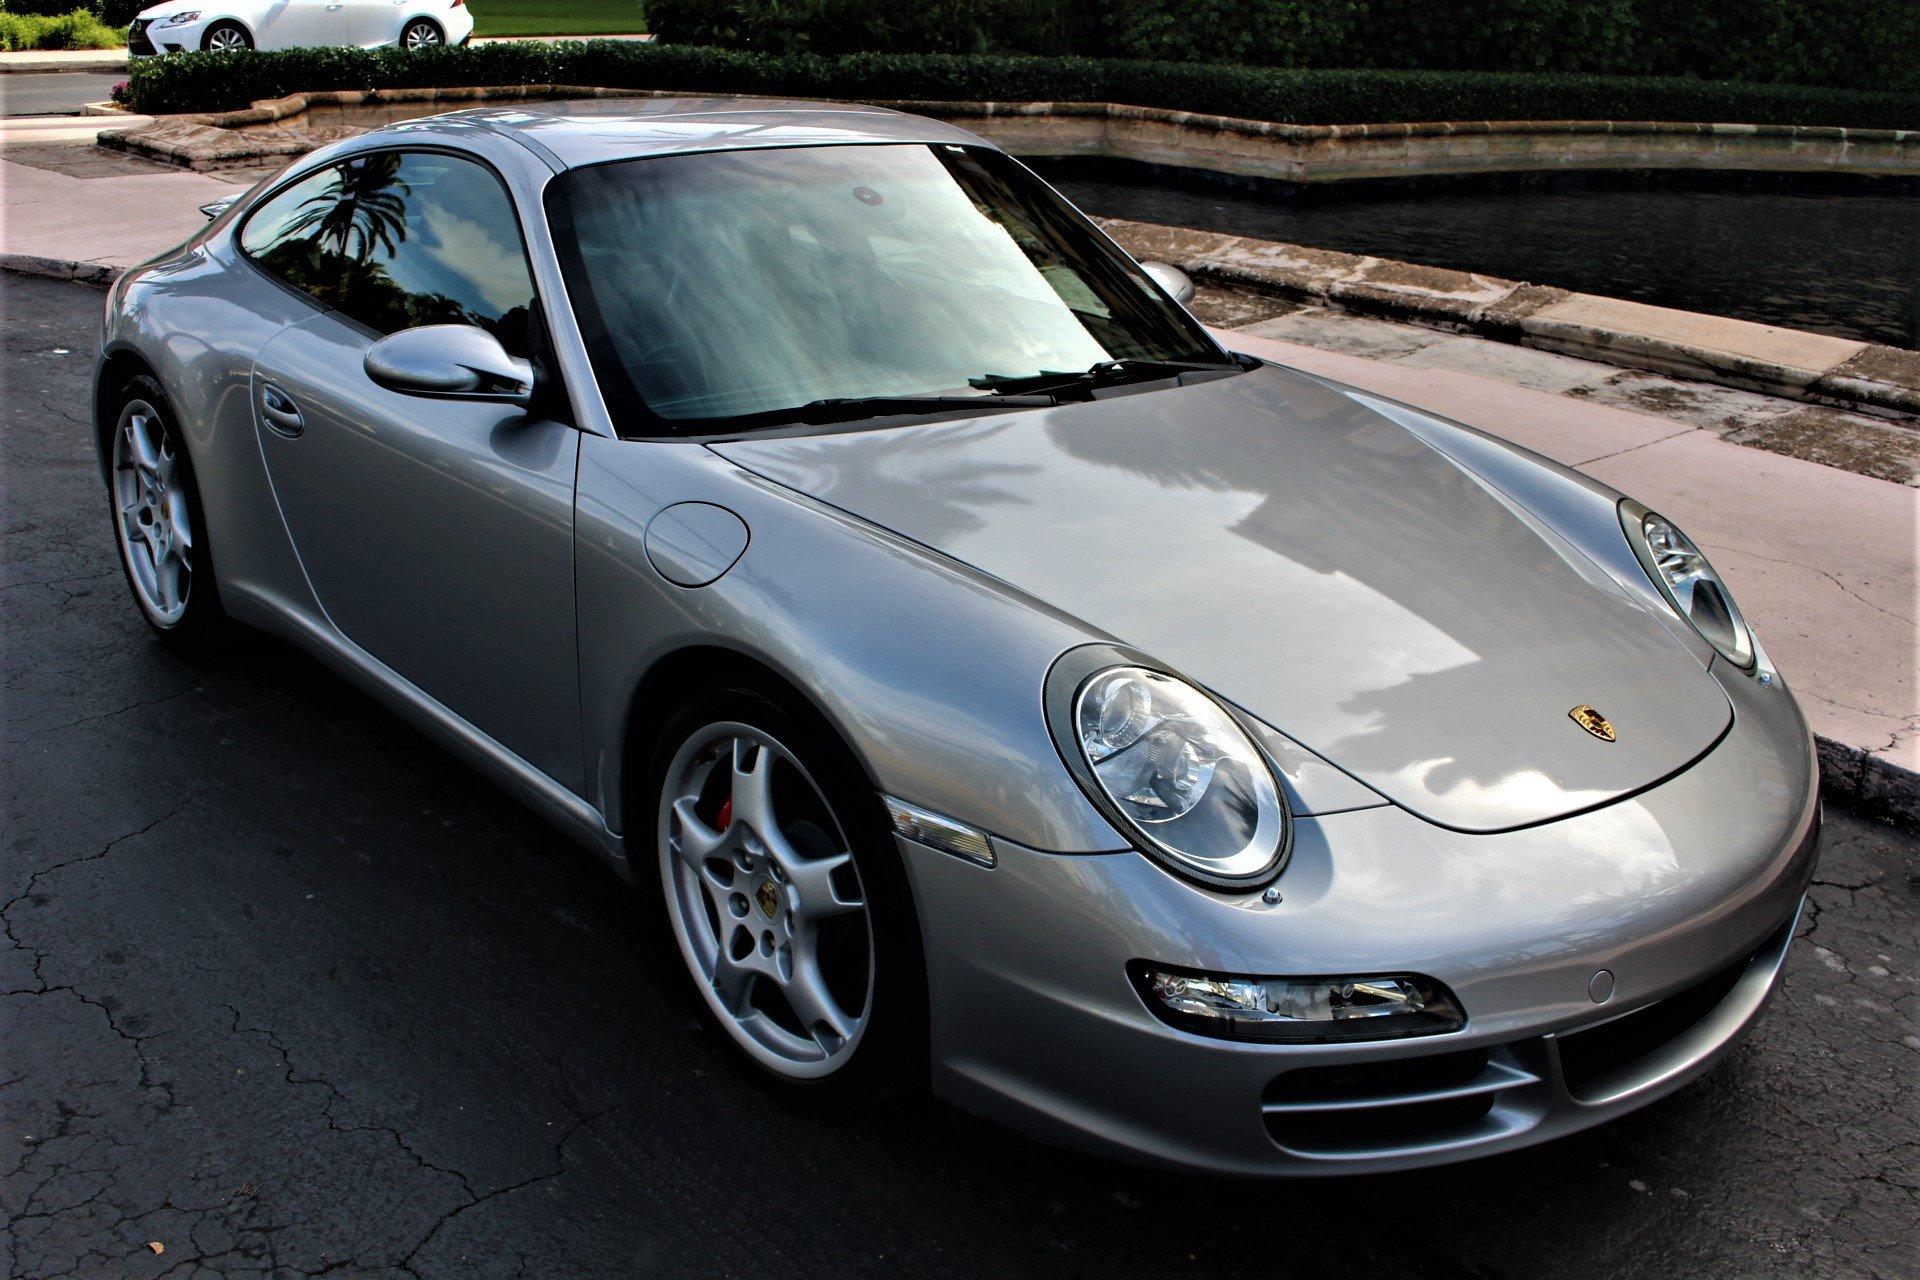 Used 2007 Porsche 911 Carrera S for sale $42,850 at The Gables Sports Cars in Miami FL 33146 3